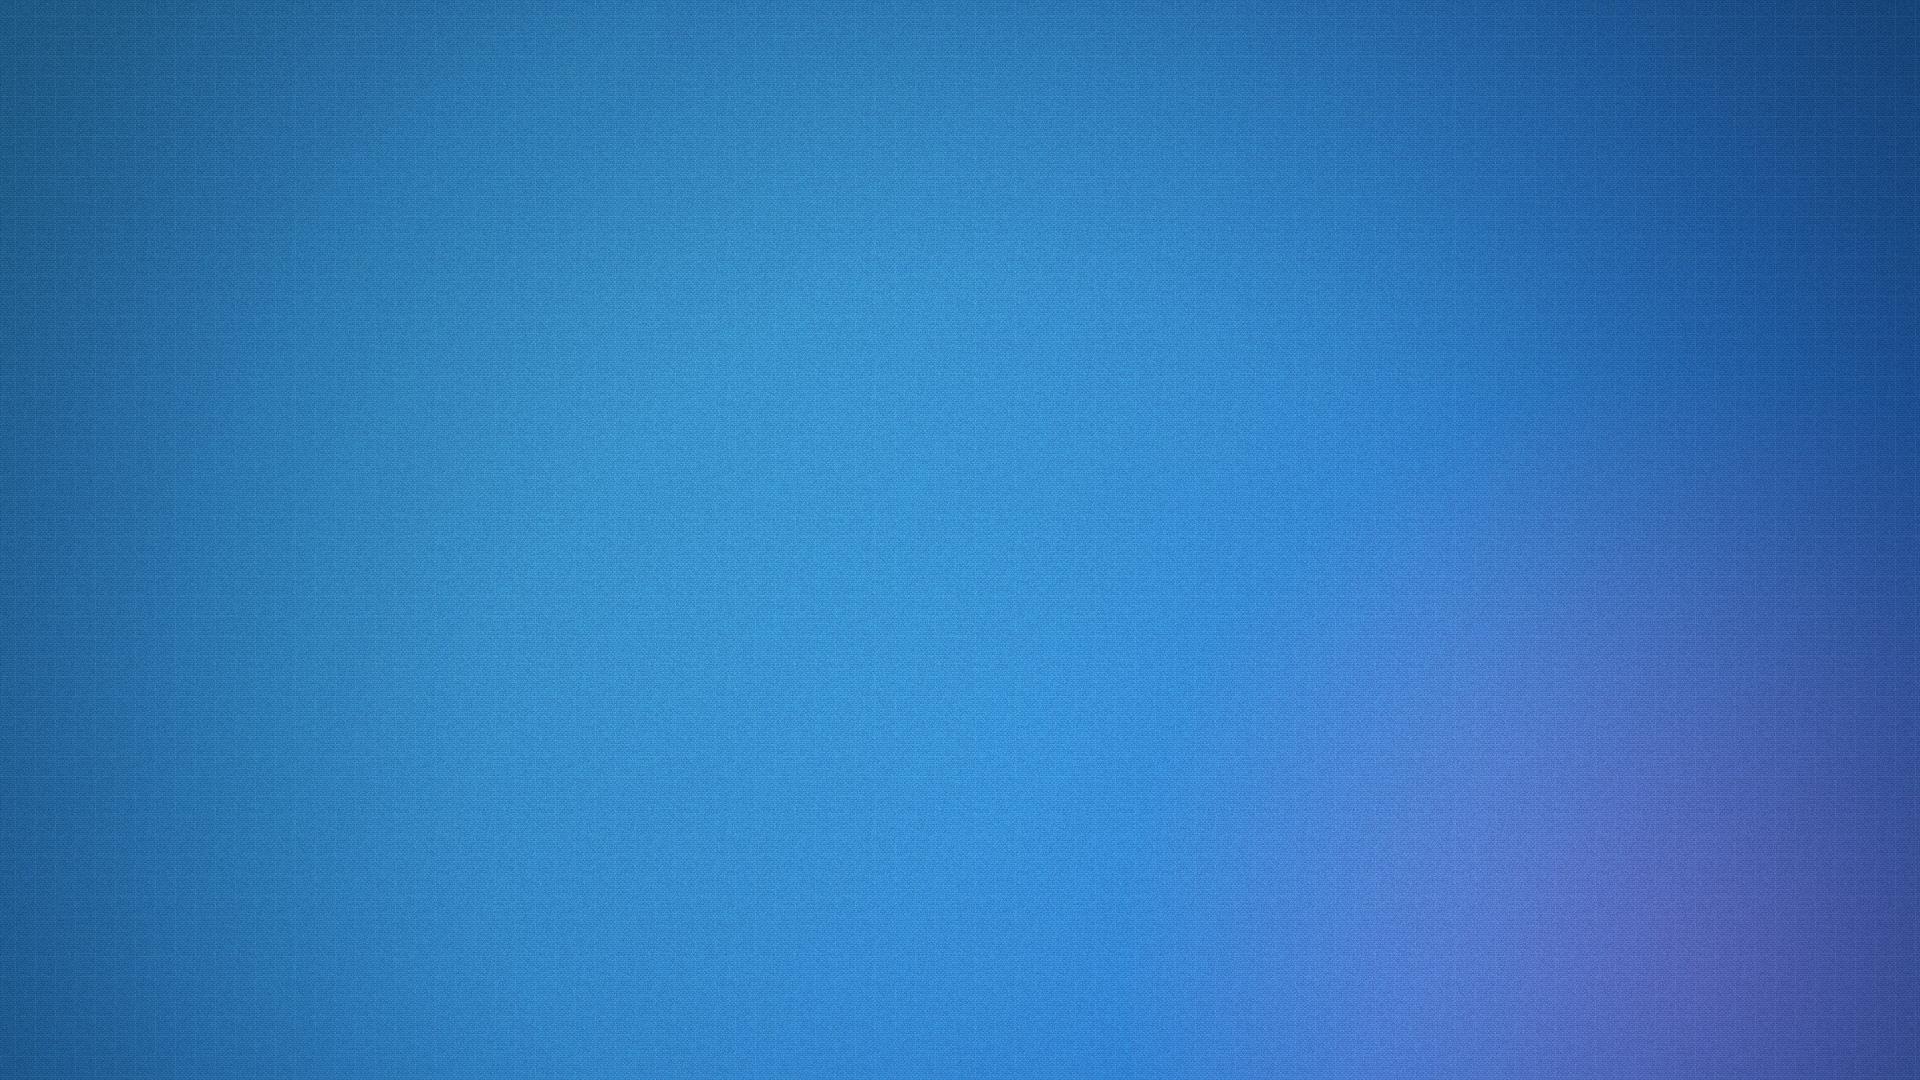 CobaltCanvas-LightBlue-1920x1080